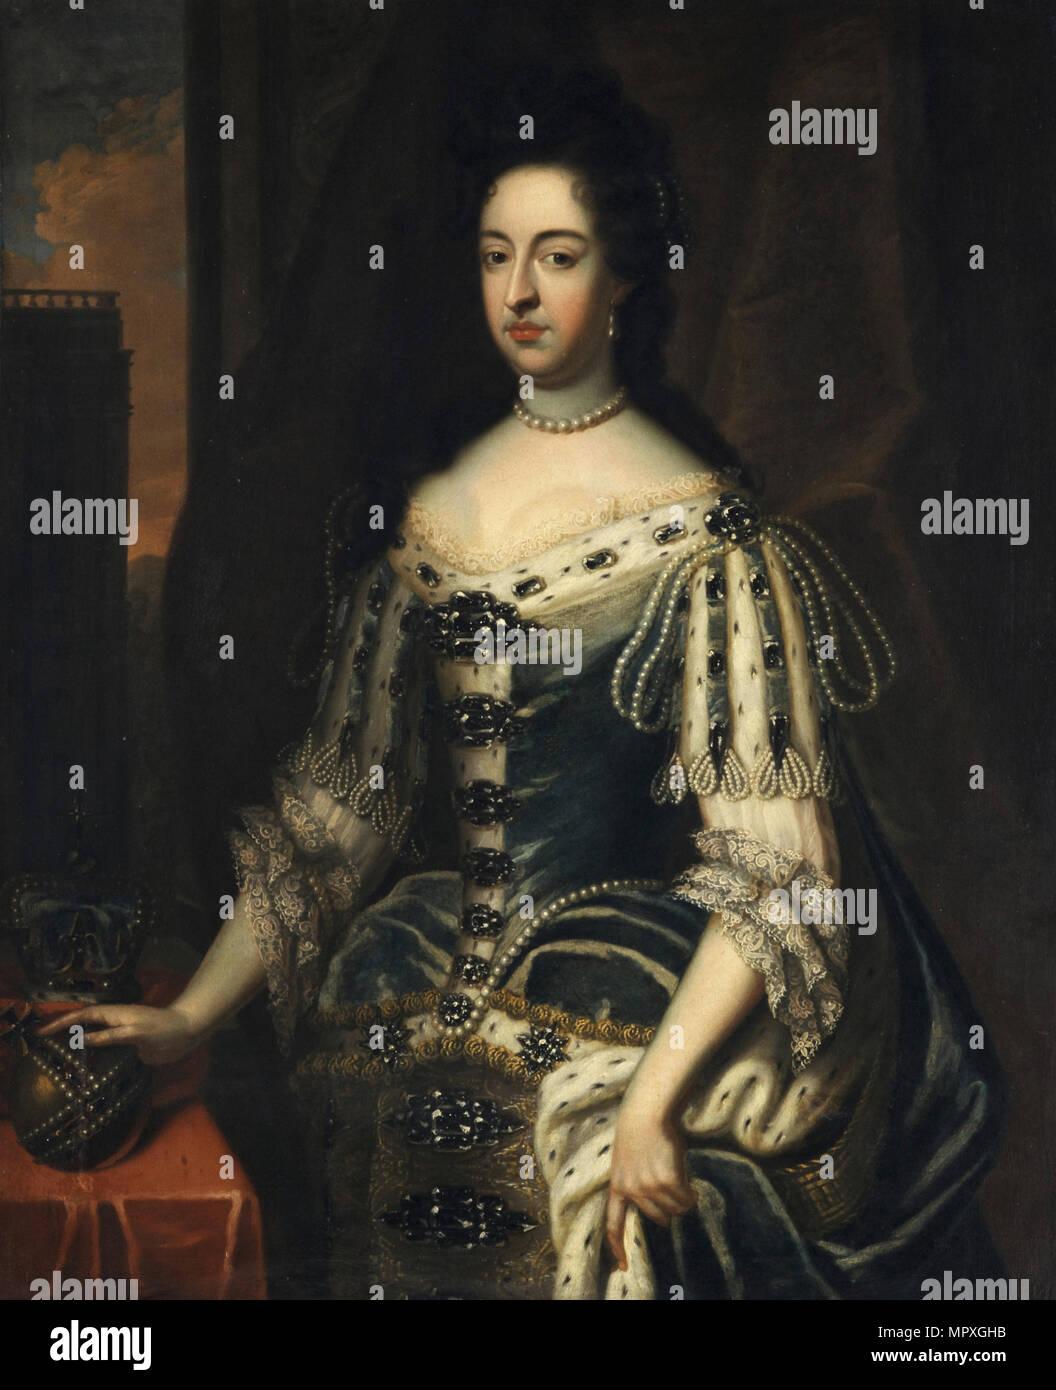 Retrato de María II de Inglaterra (1662-1694). Imagen De Stock